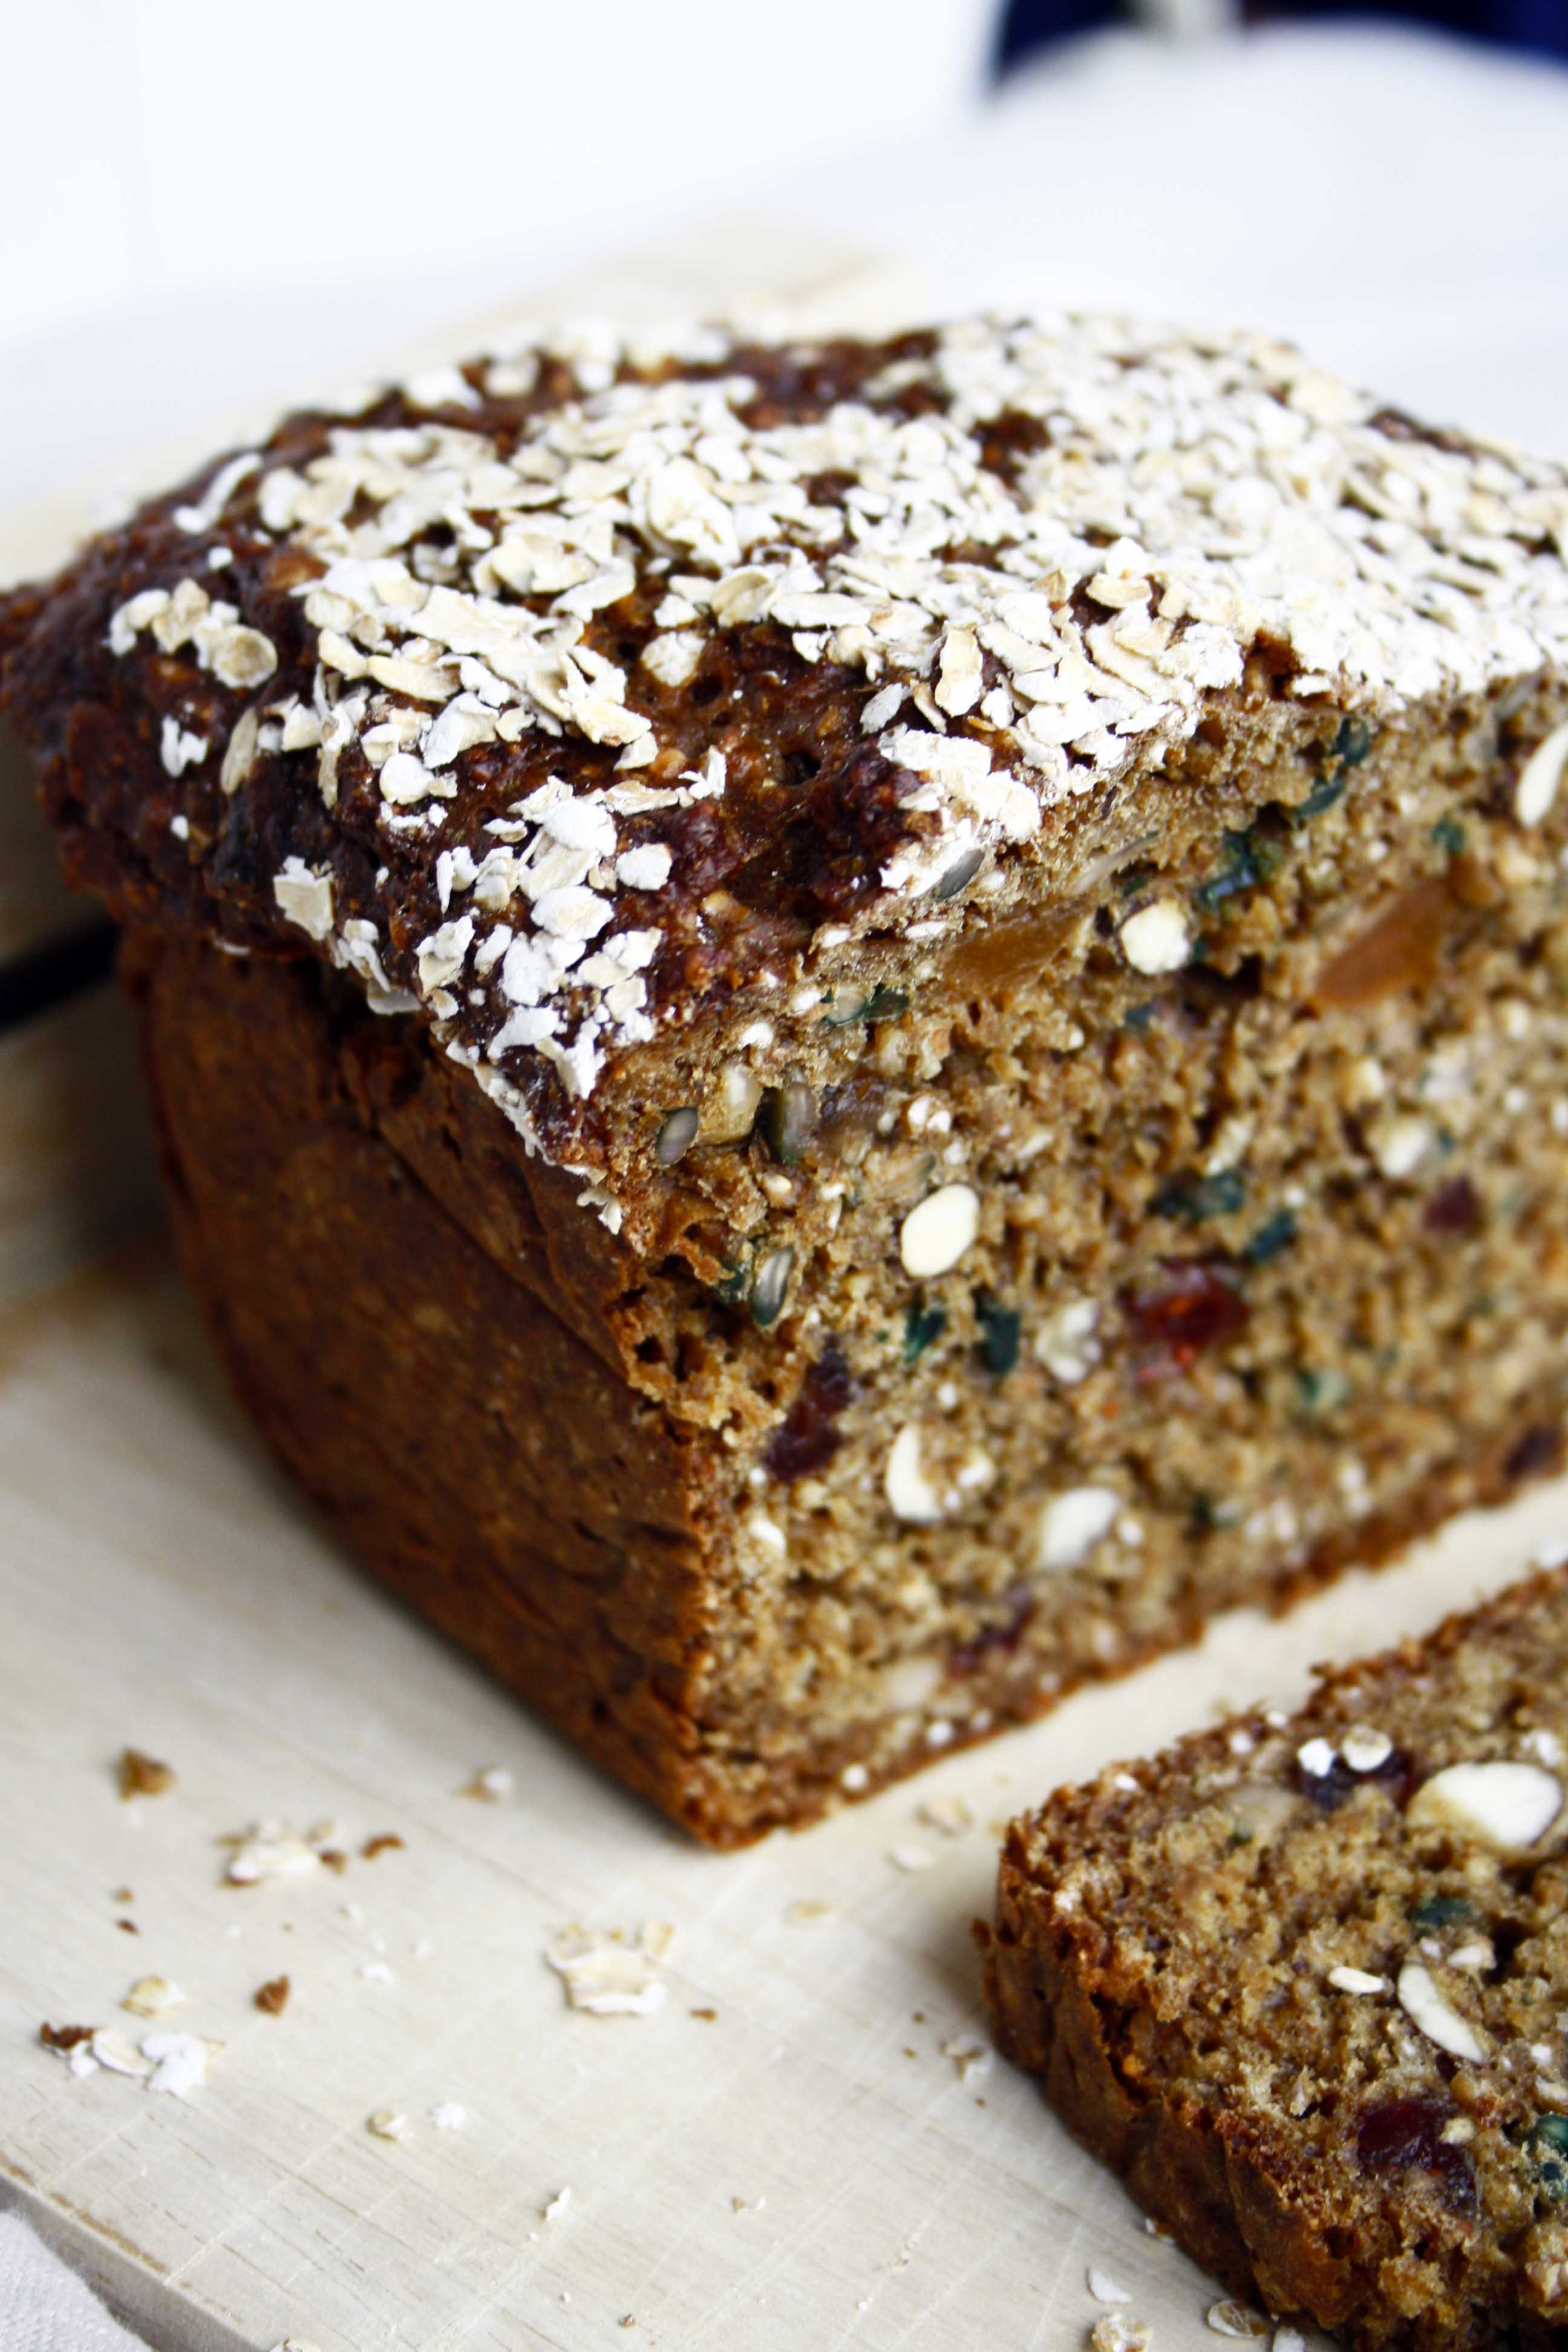 Schnelles Schwedenbrot // Easy Swedish bread by http://babyrockmyday.com/schnelles-schwedenbrot/